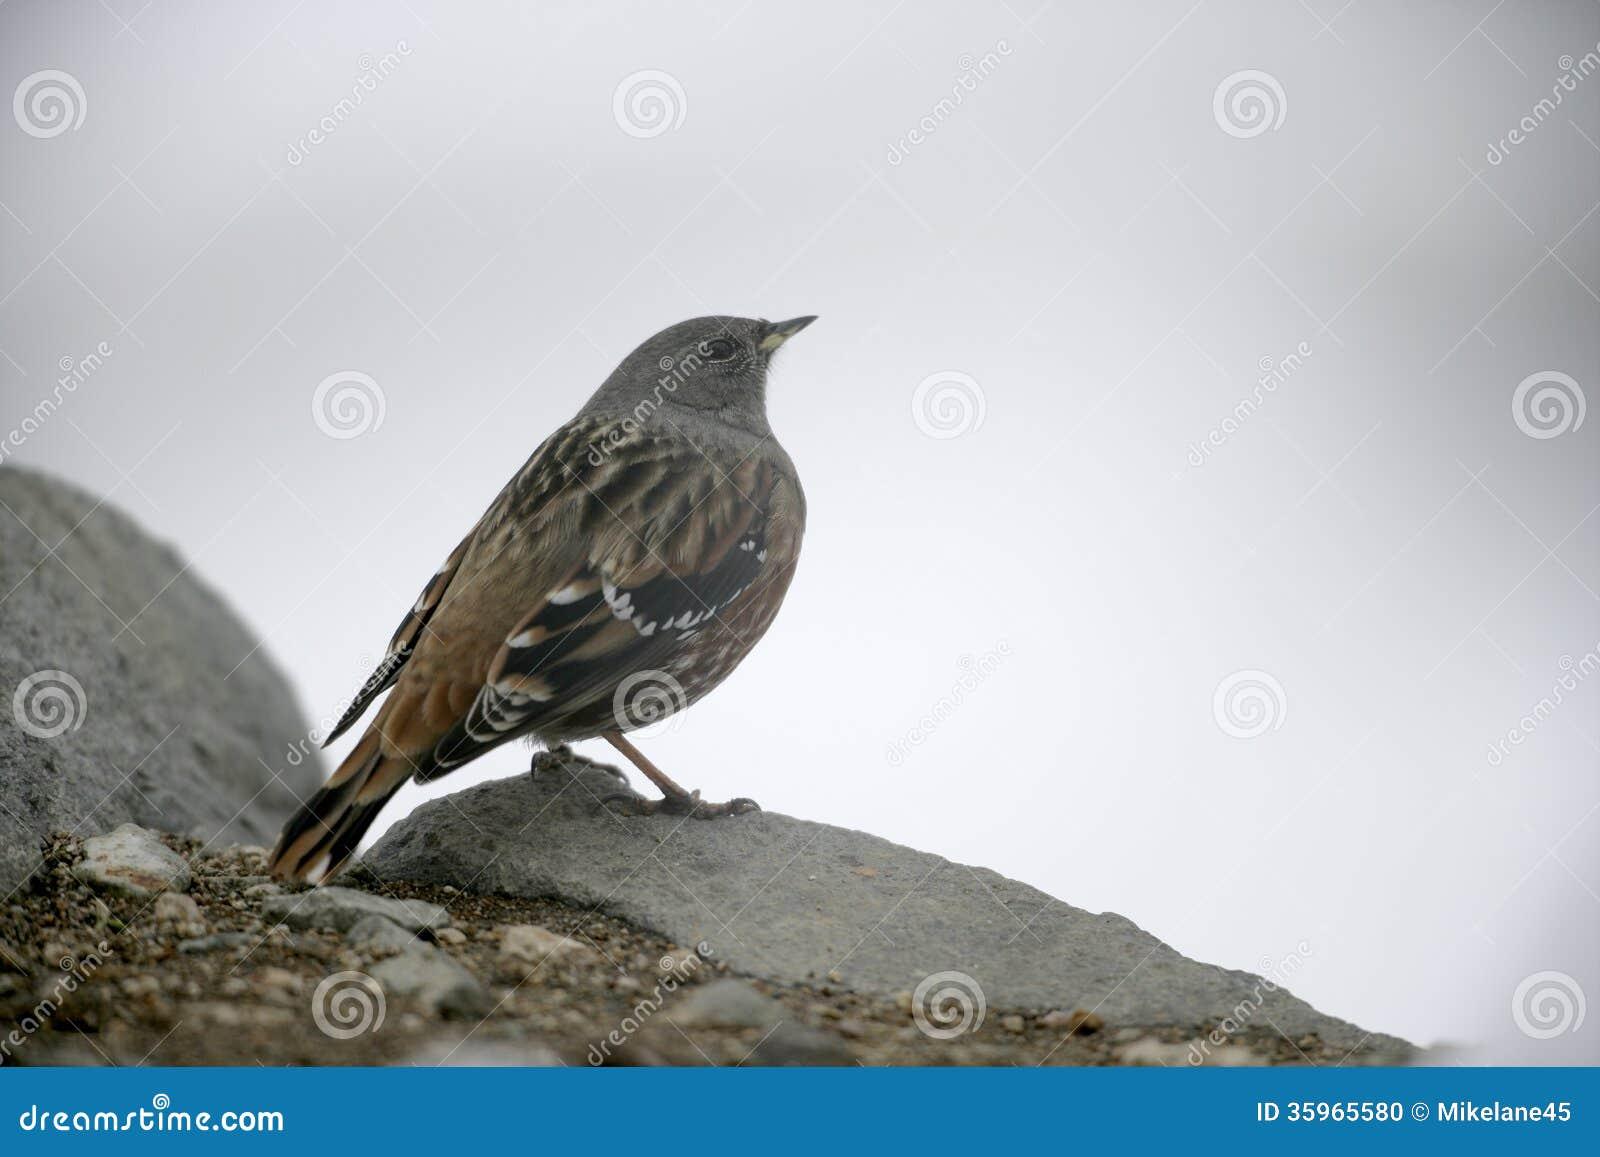 Alpine accentor, Prunella collaris